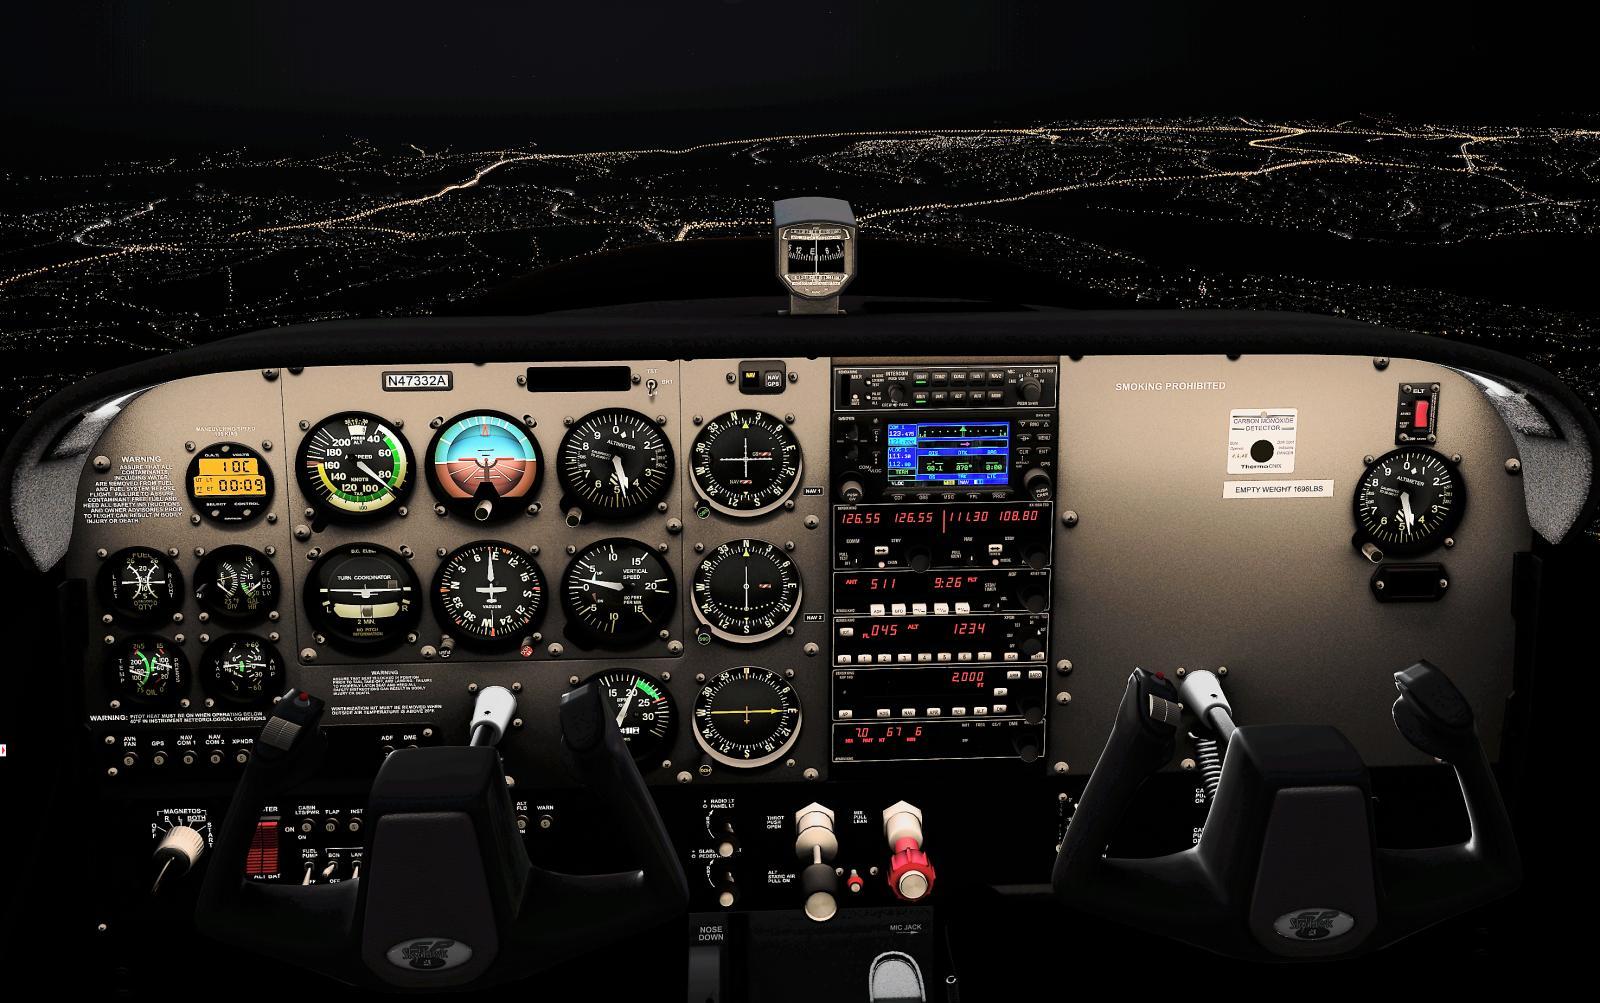 İsim:  Airfoillabs_C172SP_high_res_16.jpg Görüntüleme: 368 Büyüklük:  233.4 KB (Kilobyte)